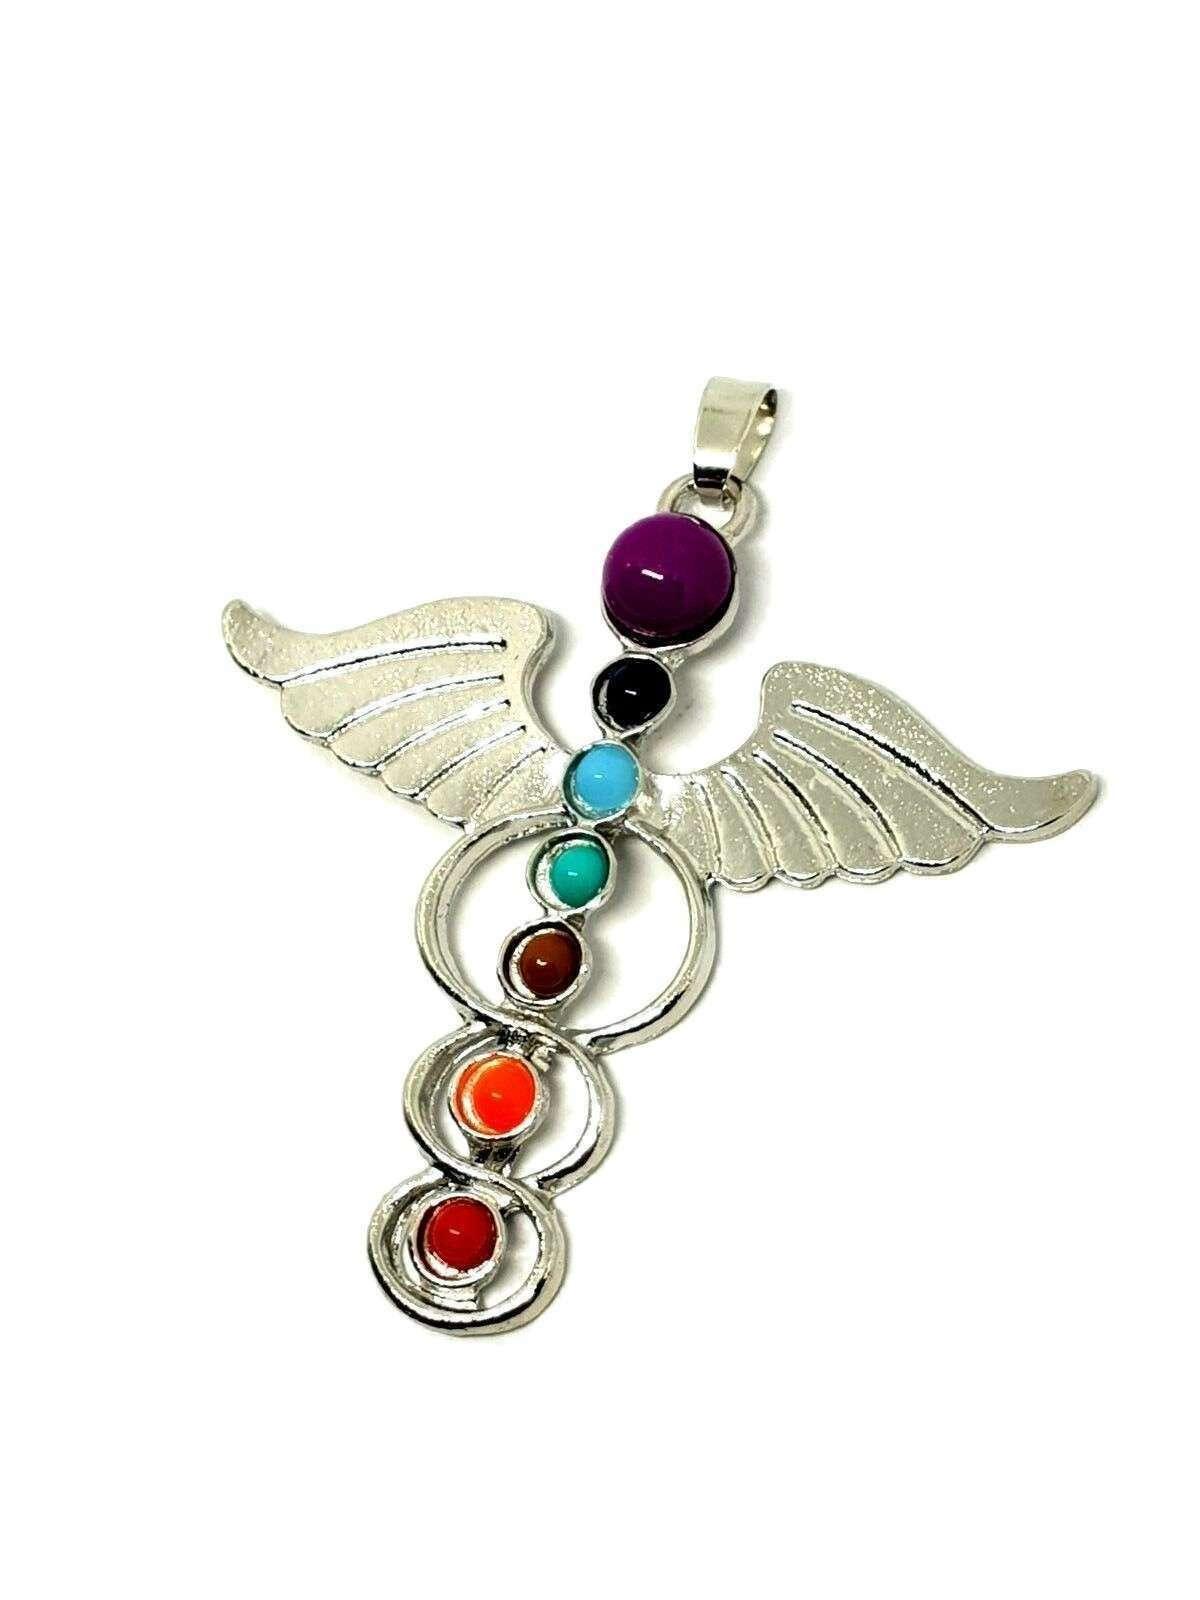 Hermes Winged Beautiful Chakra Silver Tone Guardian Angel Wing Pendant Gift image 2